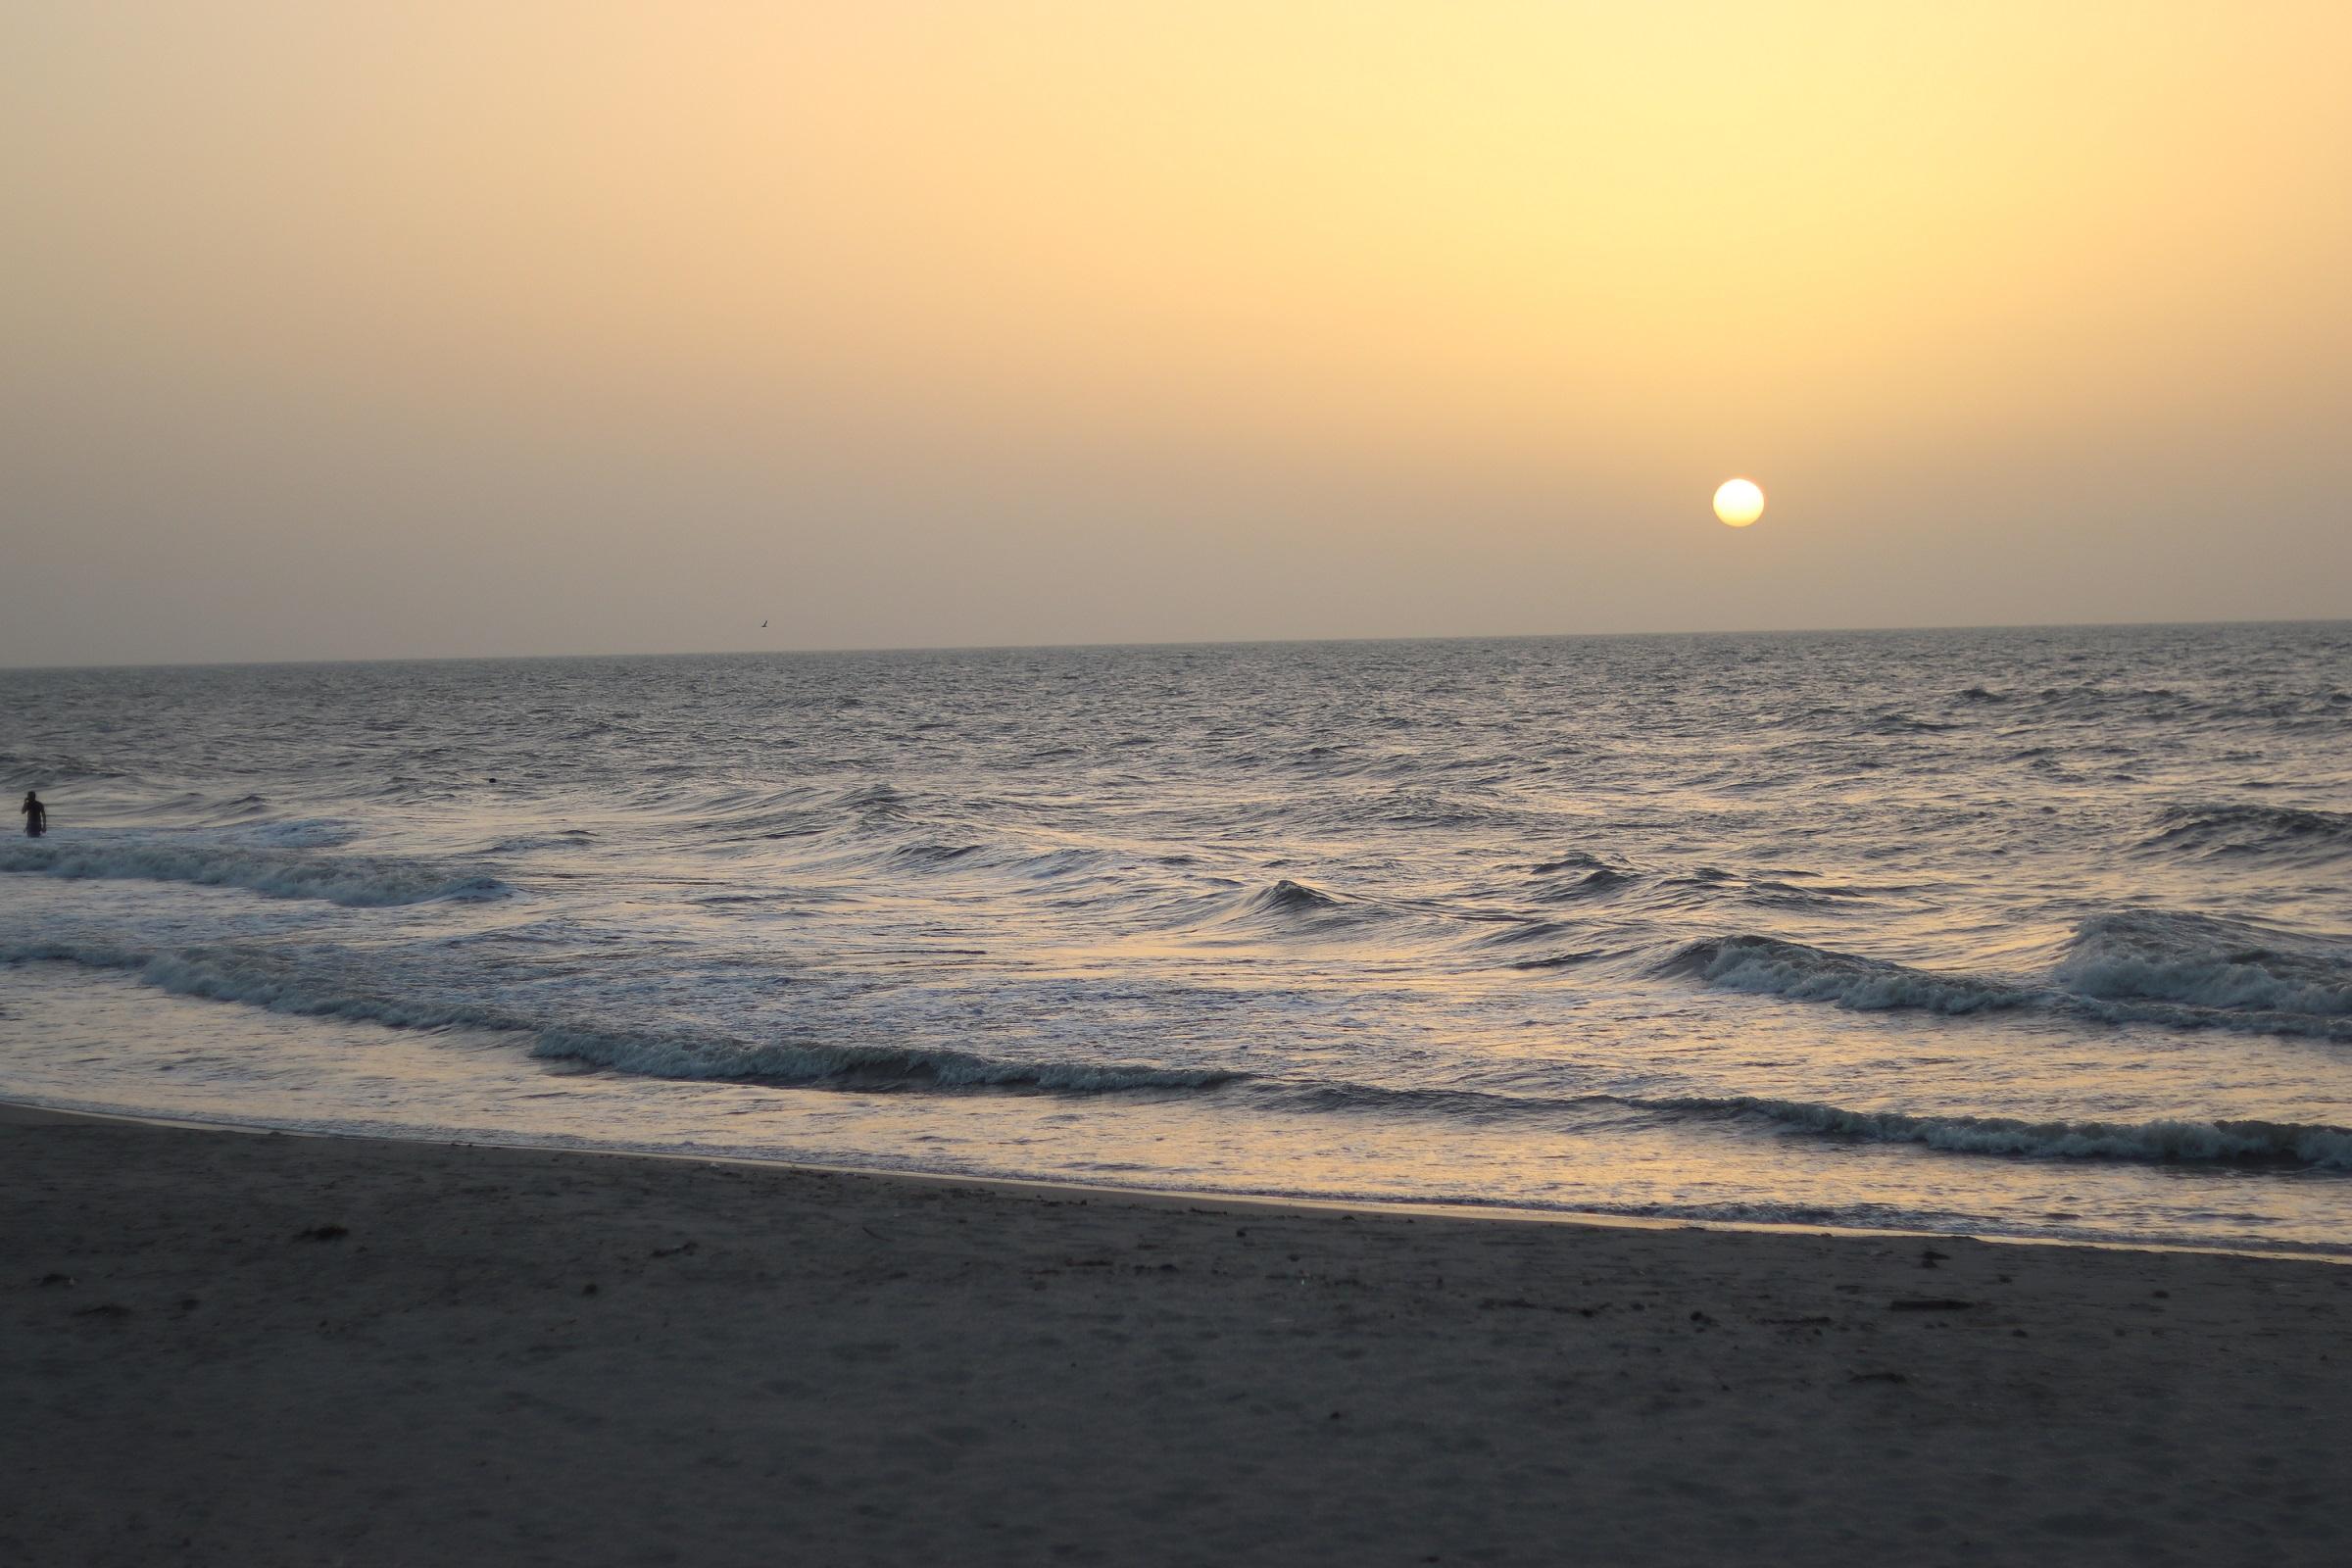 Cruzando el desierto: La llegada  #SerieSBCenLaGuajira